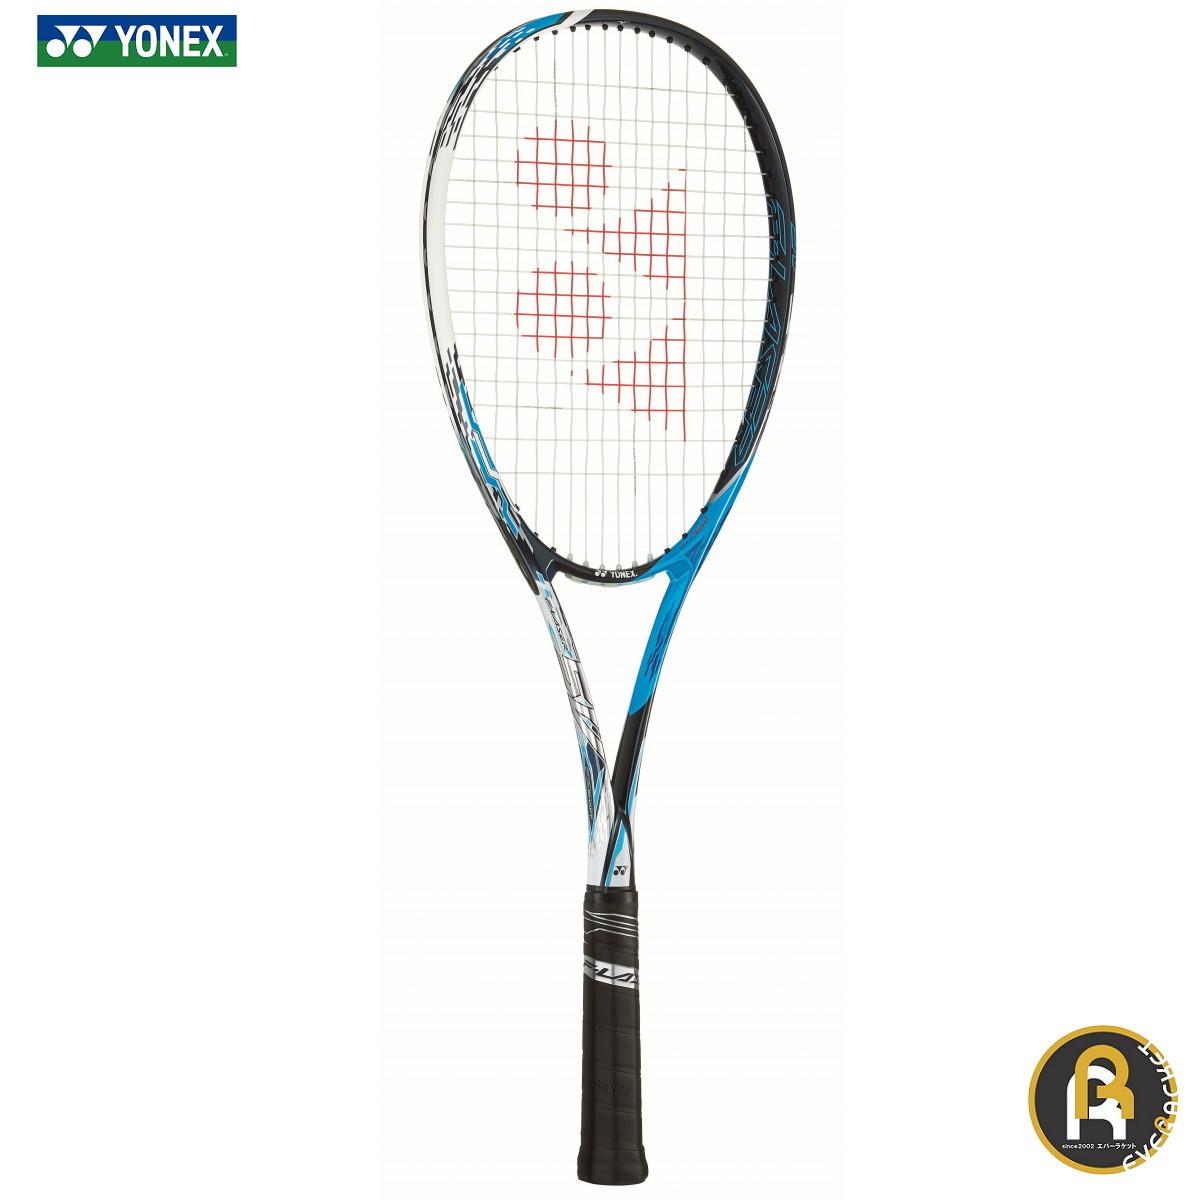 YONEX ヨネックス ソフトテニス ソフトテニスラケット エフレーザー5V FLR5V《S張り・V張り対応》《前衛向き》